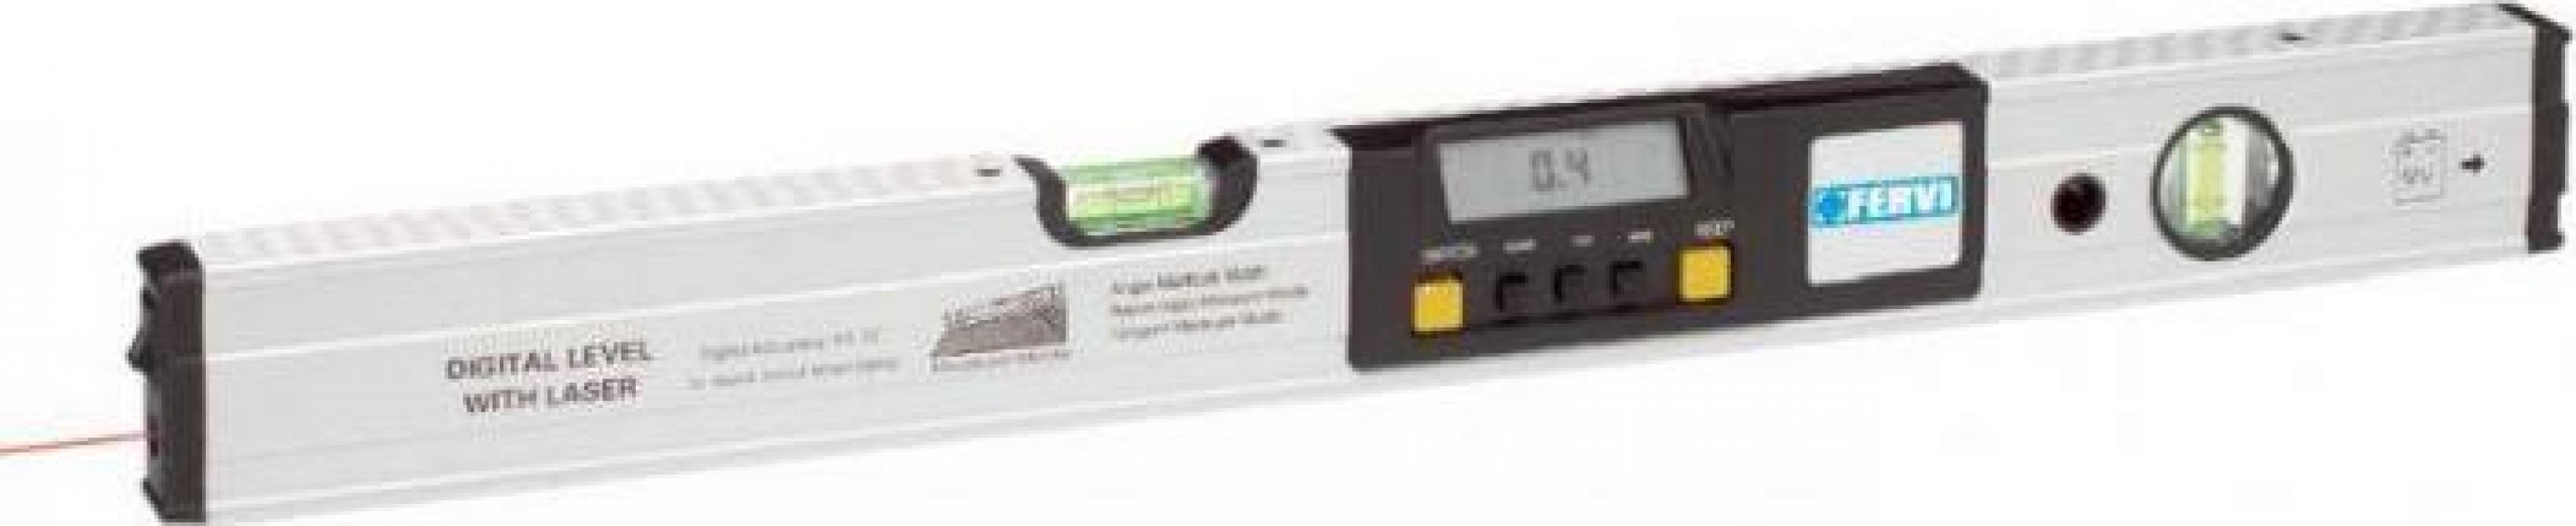 Nivela laser cu afisaj digital 0666